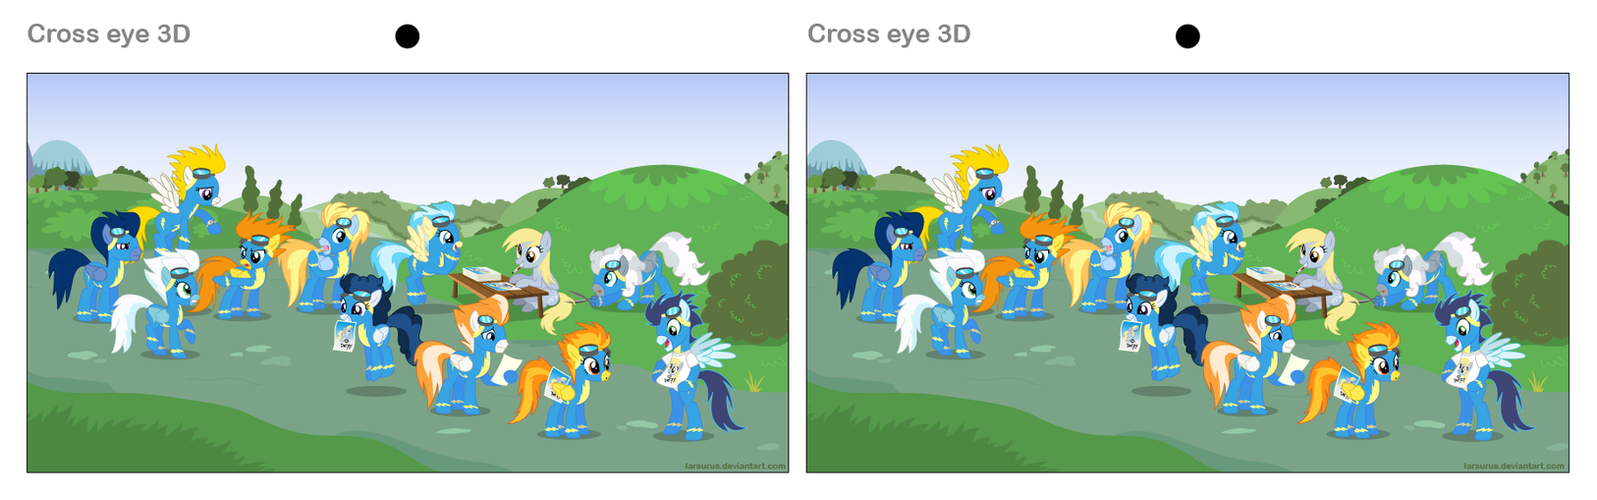 cross eye 3d test by larsurus on deviantart